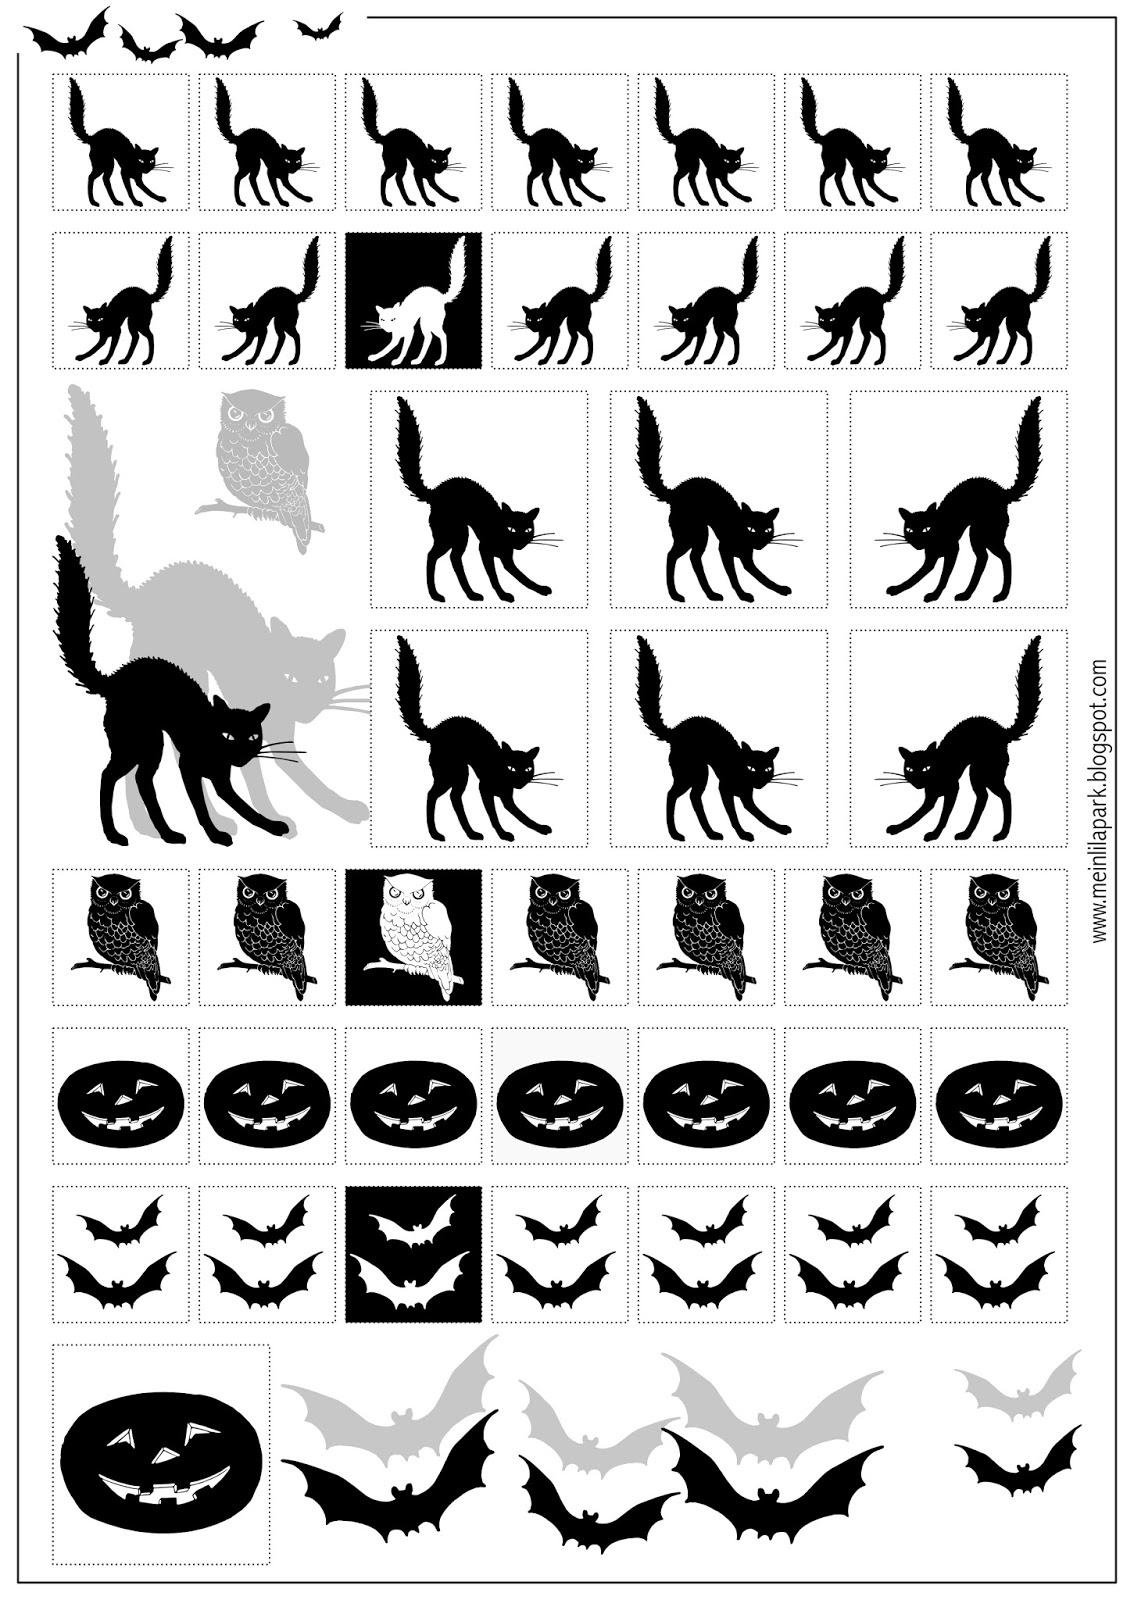 Free Printable Halloween Stickers Black And White